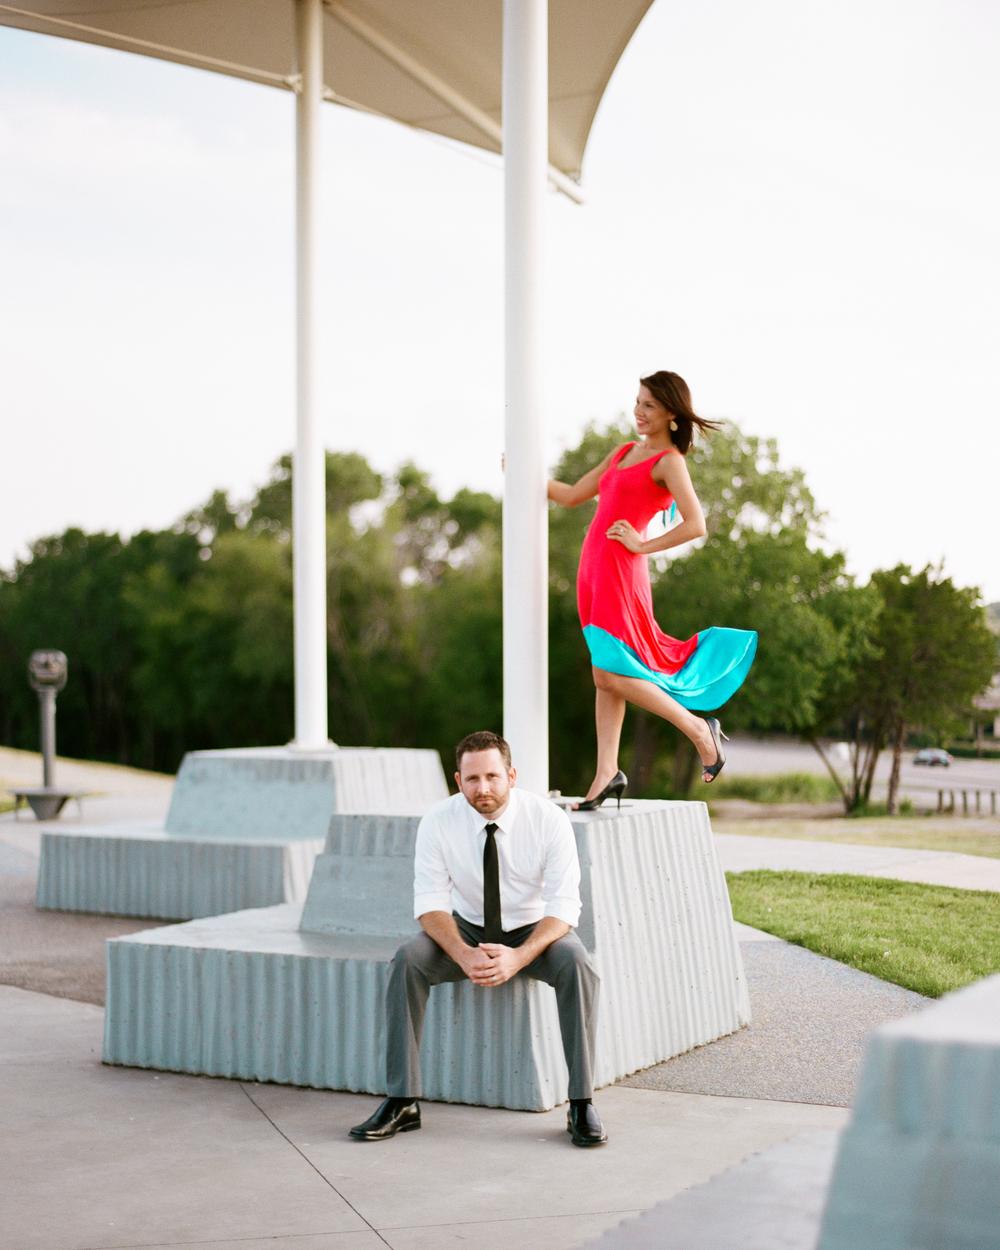 Downtown Dallas Engagement Photographer - Jessica Garmon